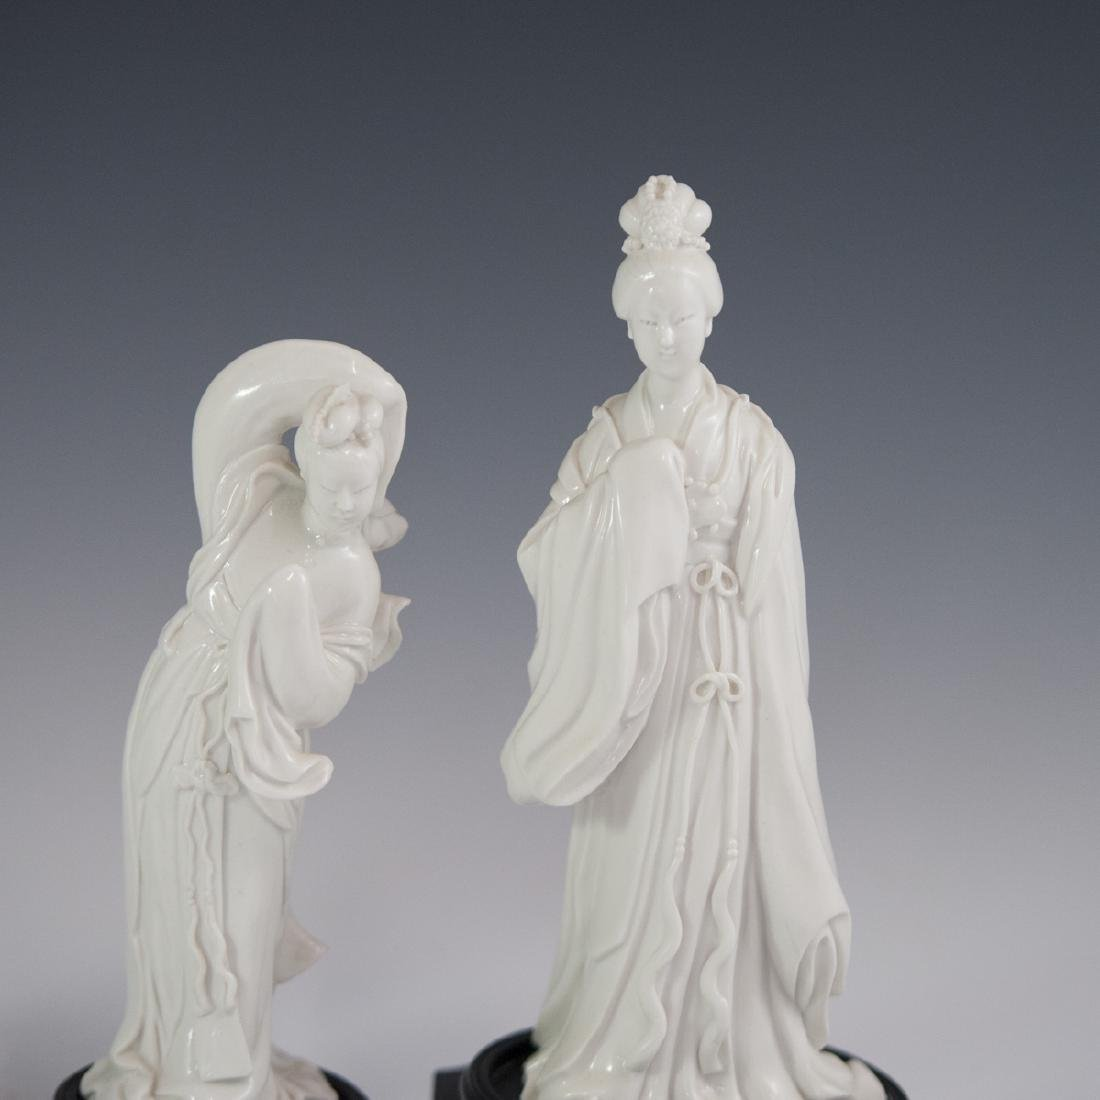 Chinese Blanc De Chine Guanyin Figurines - 4